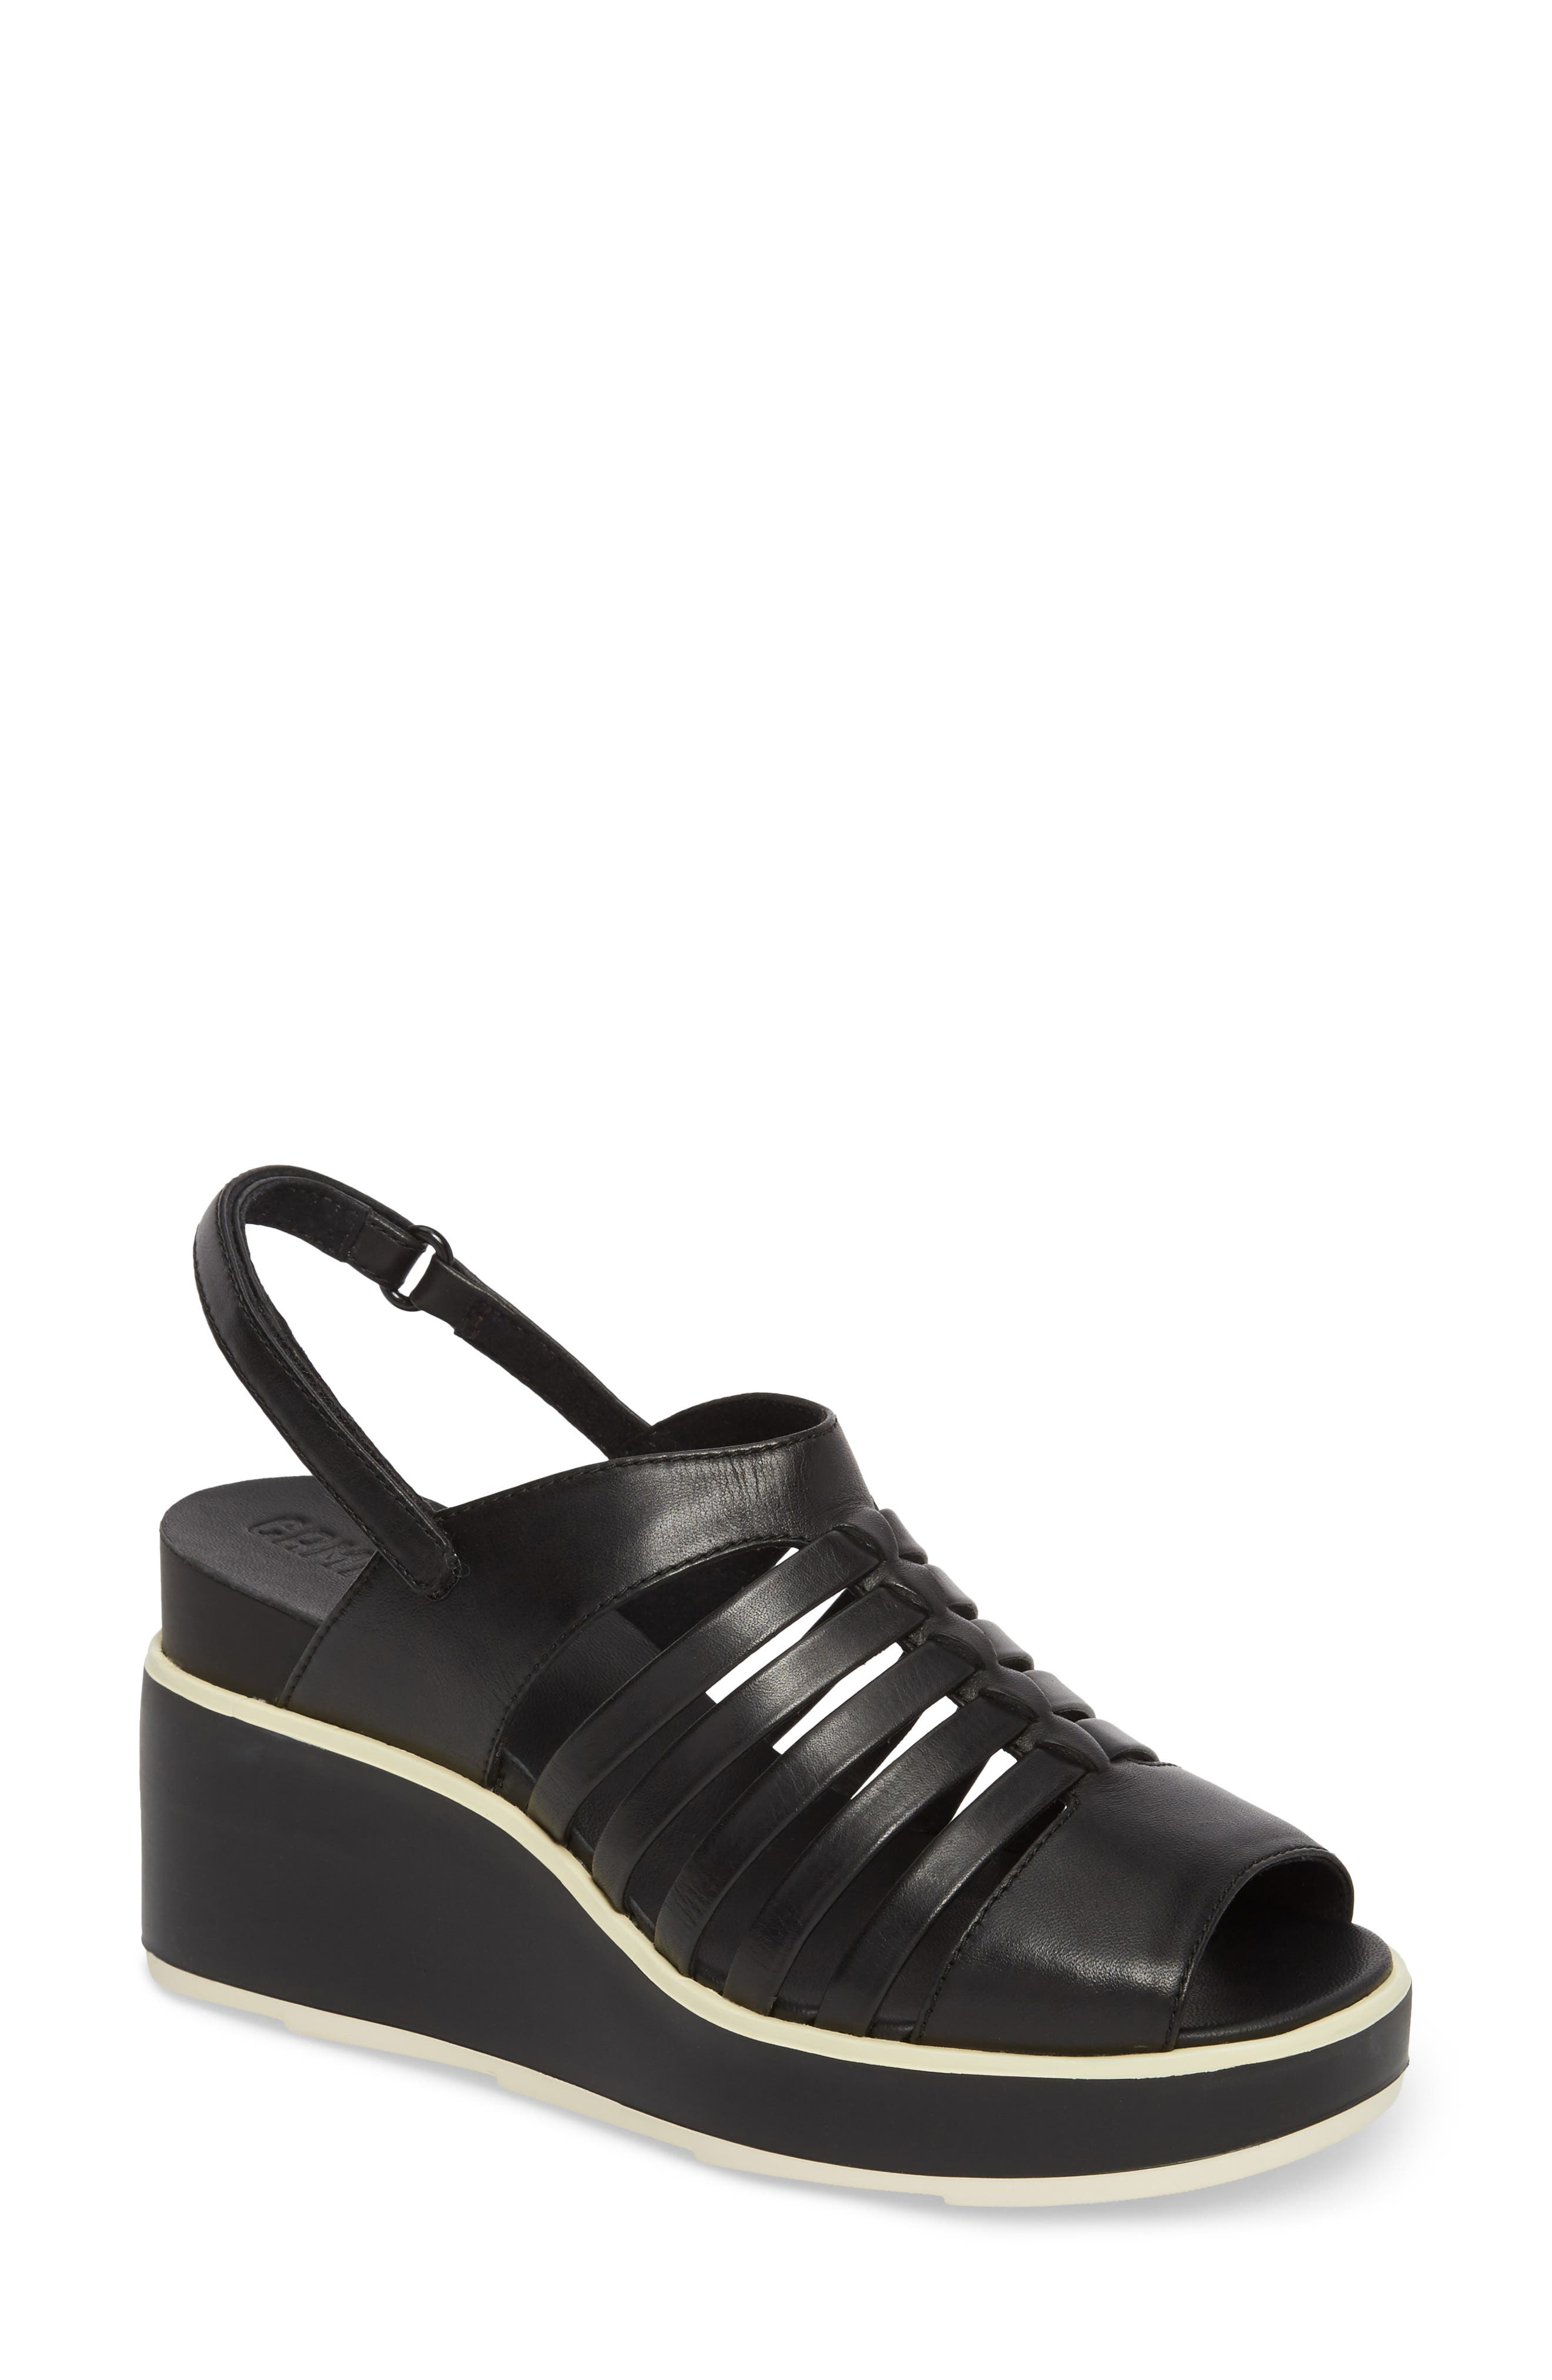 Tropik Strappy Wedge Sandal,                         Main,                         color, Black Leather